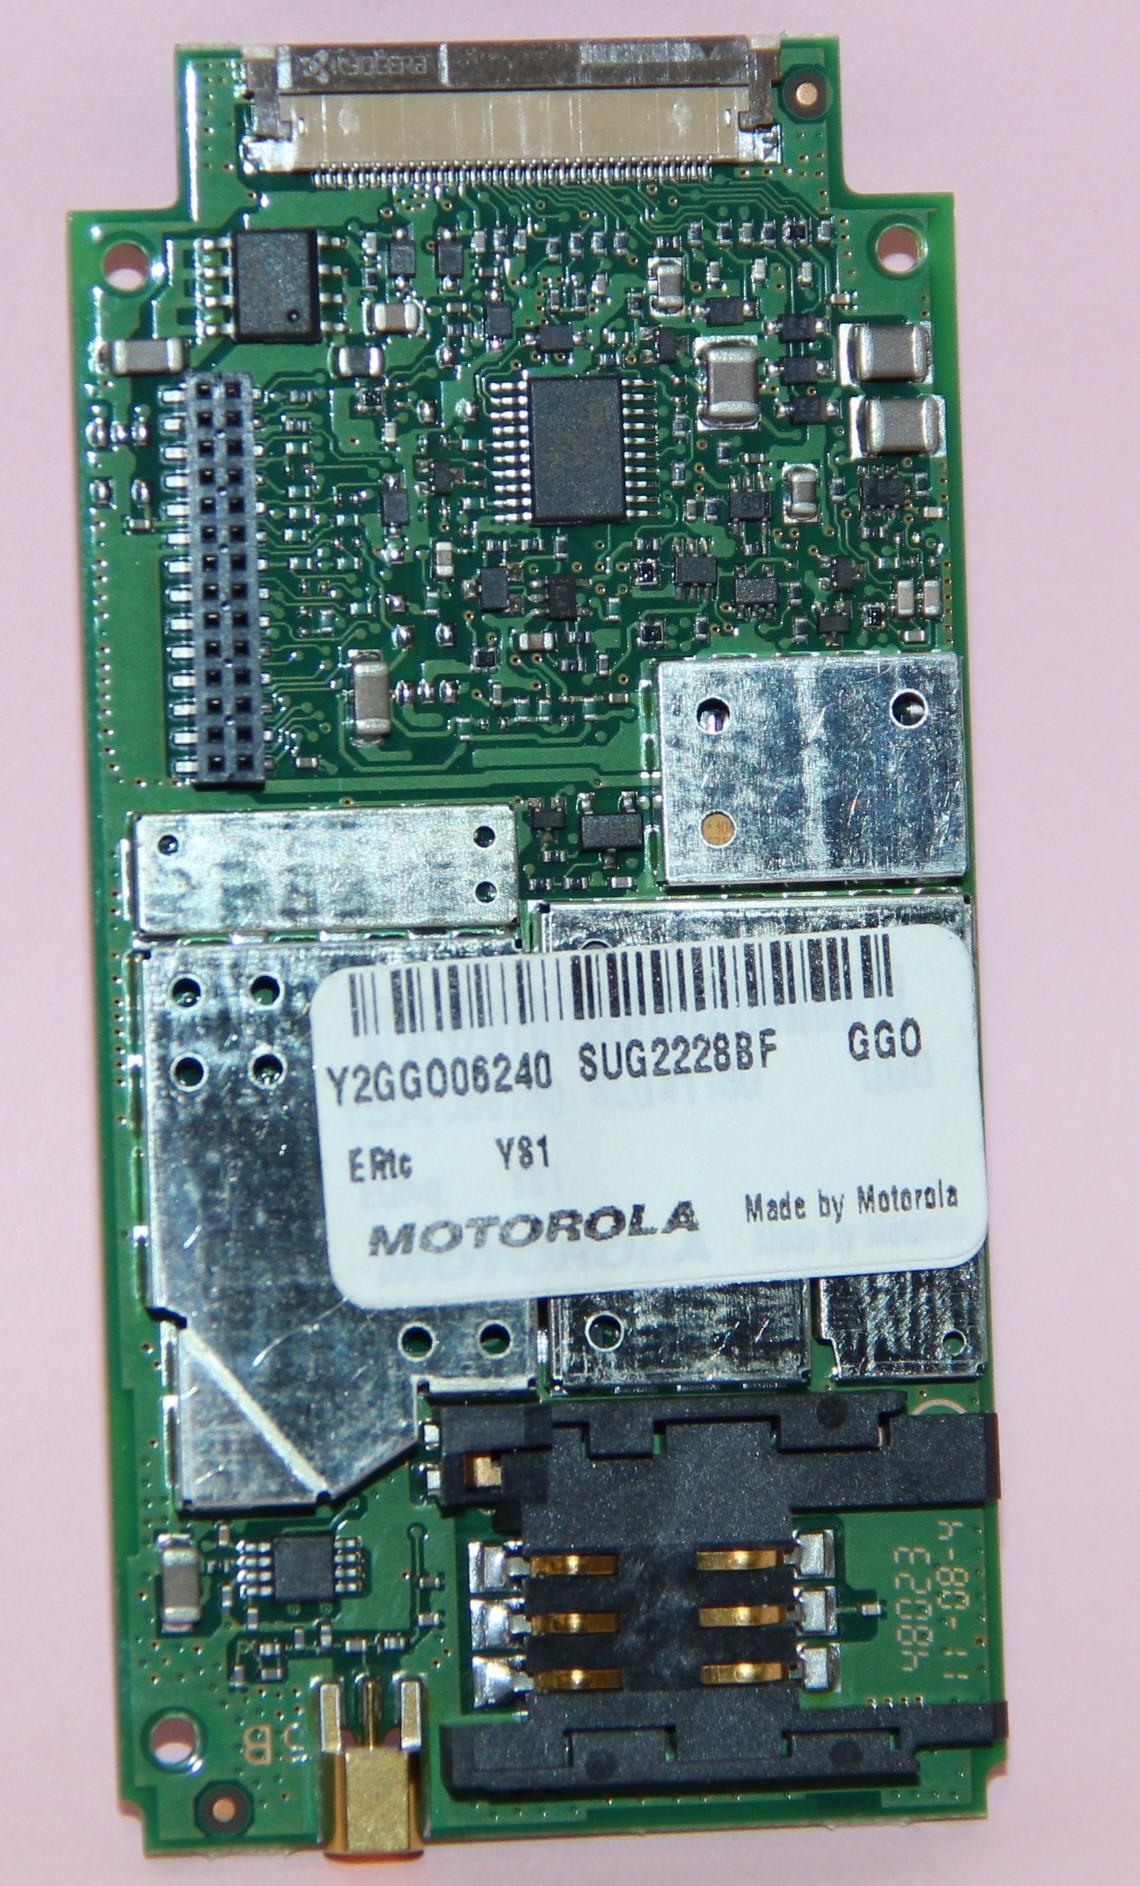 Motorola g18 GSM 900/1800/1900 Data Module Type MT3-411A21